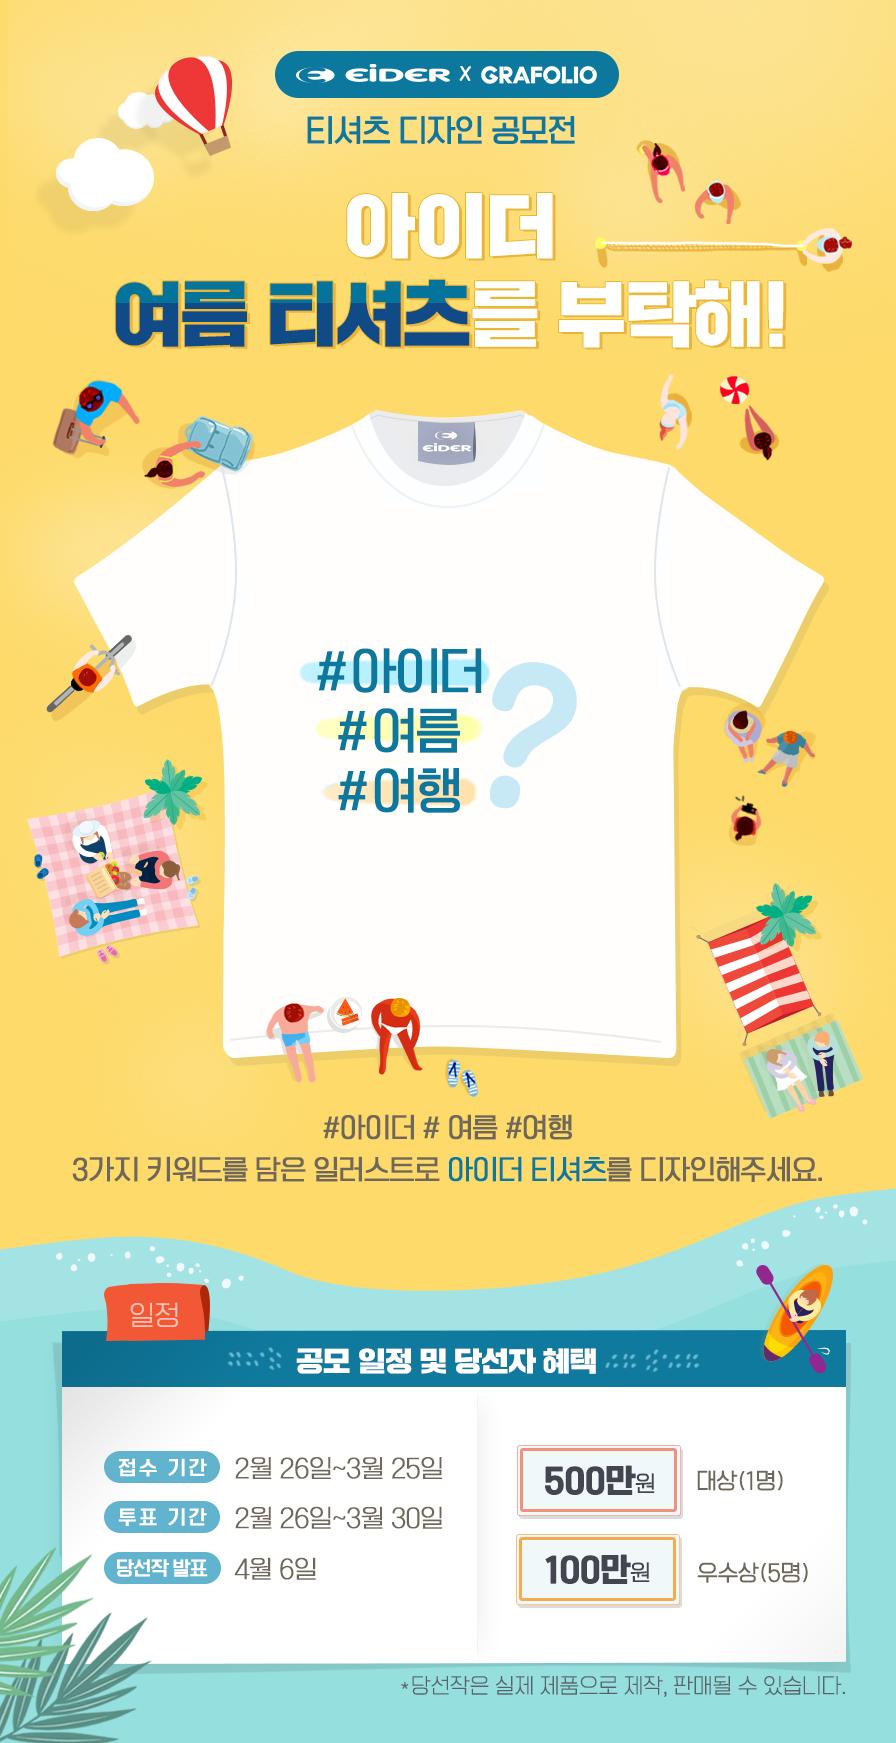 [EIDER X GRAFOLIO] 아이더 여름 티셔츠 디자인 공모전